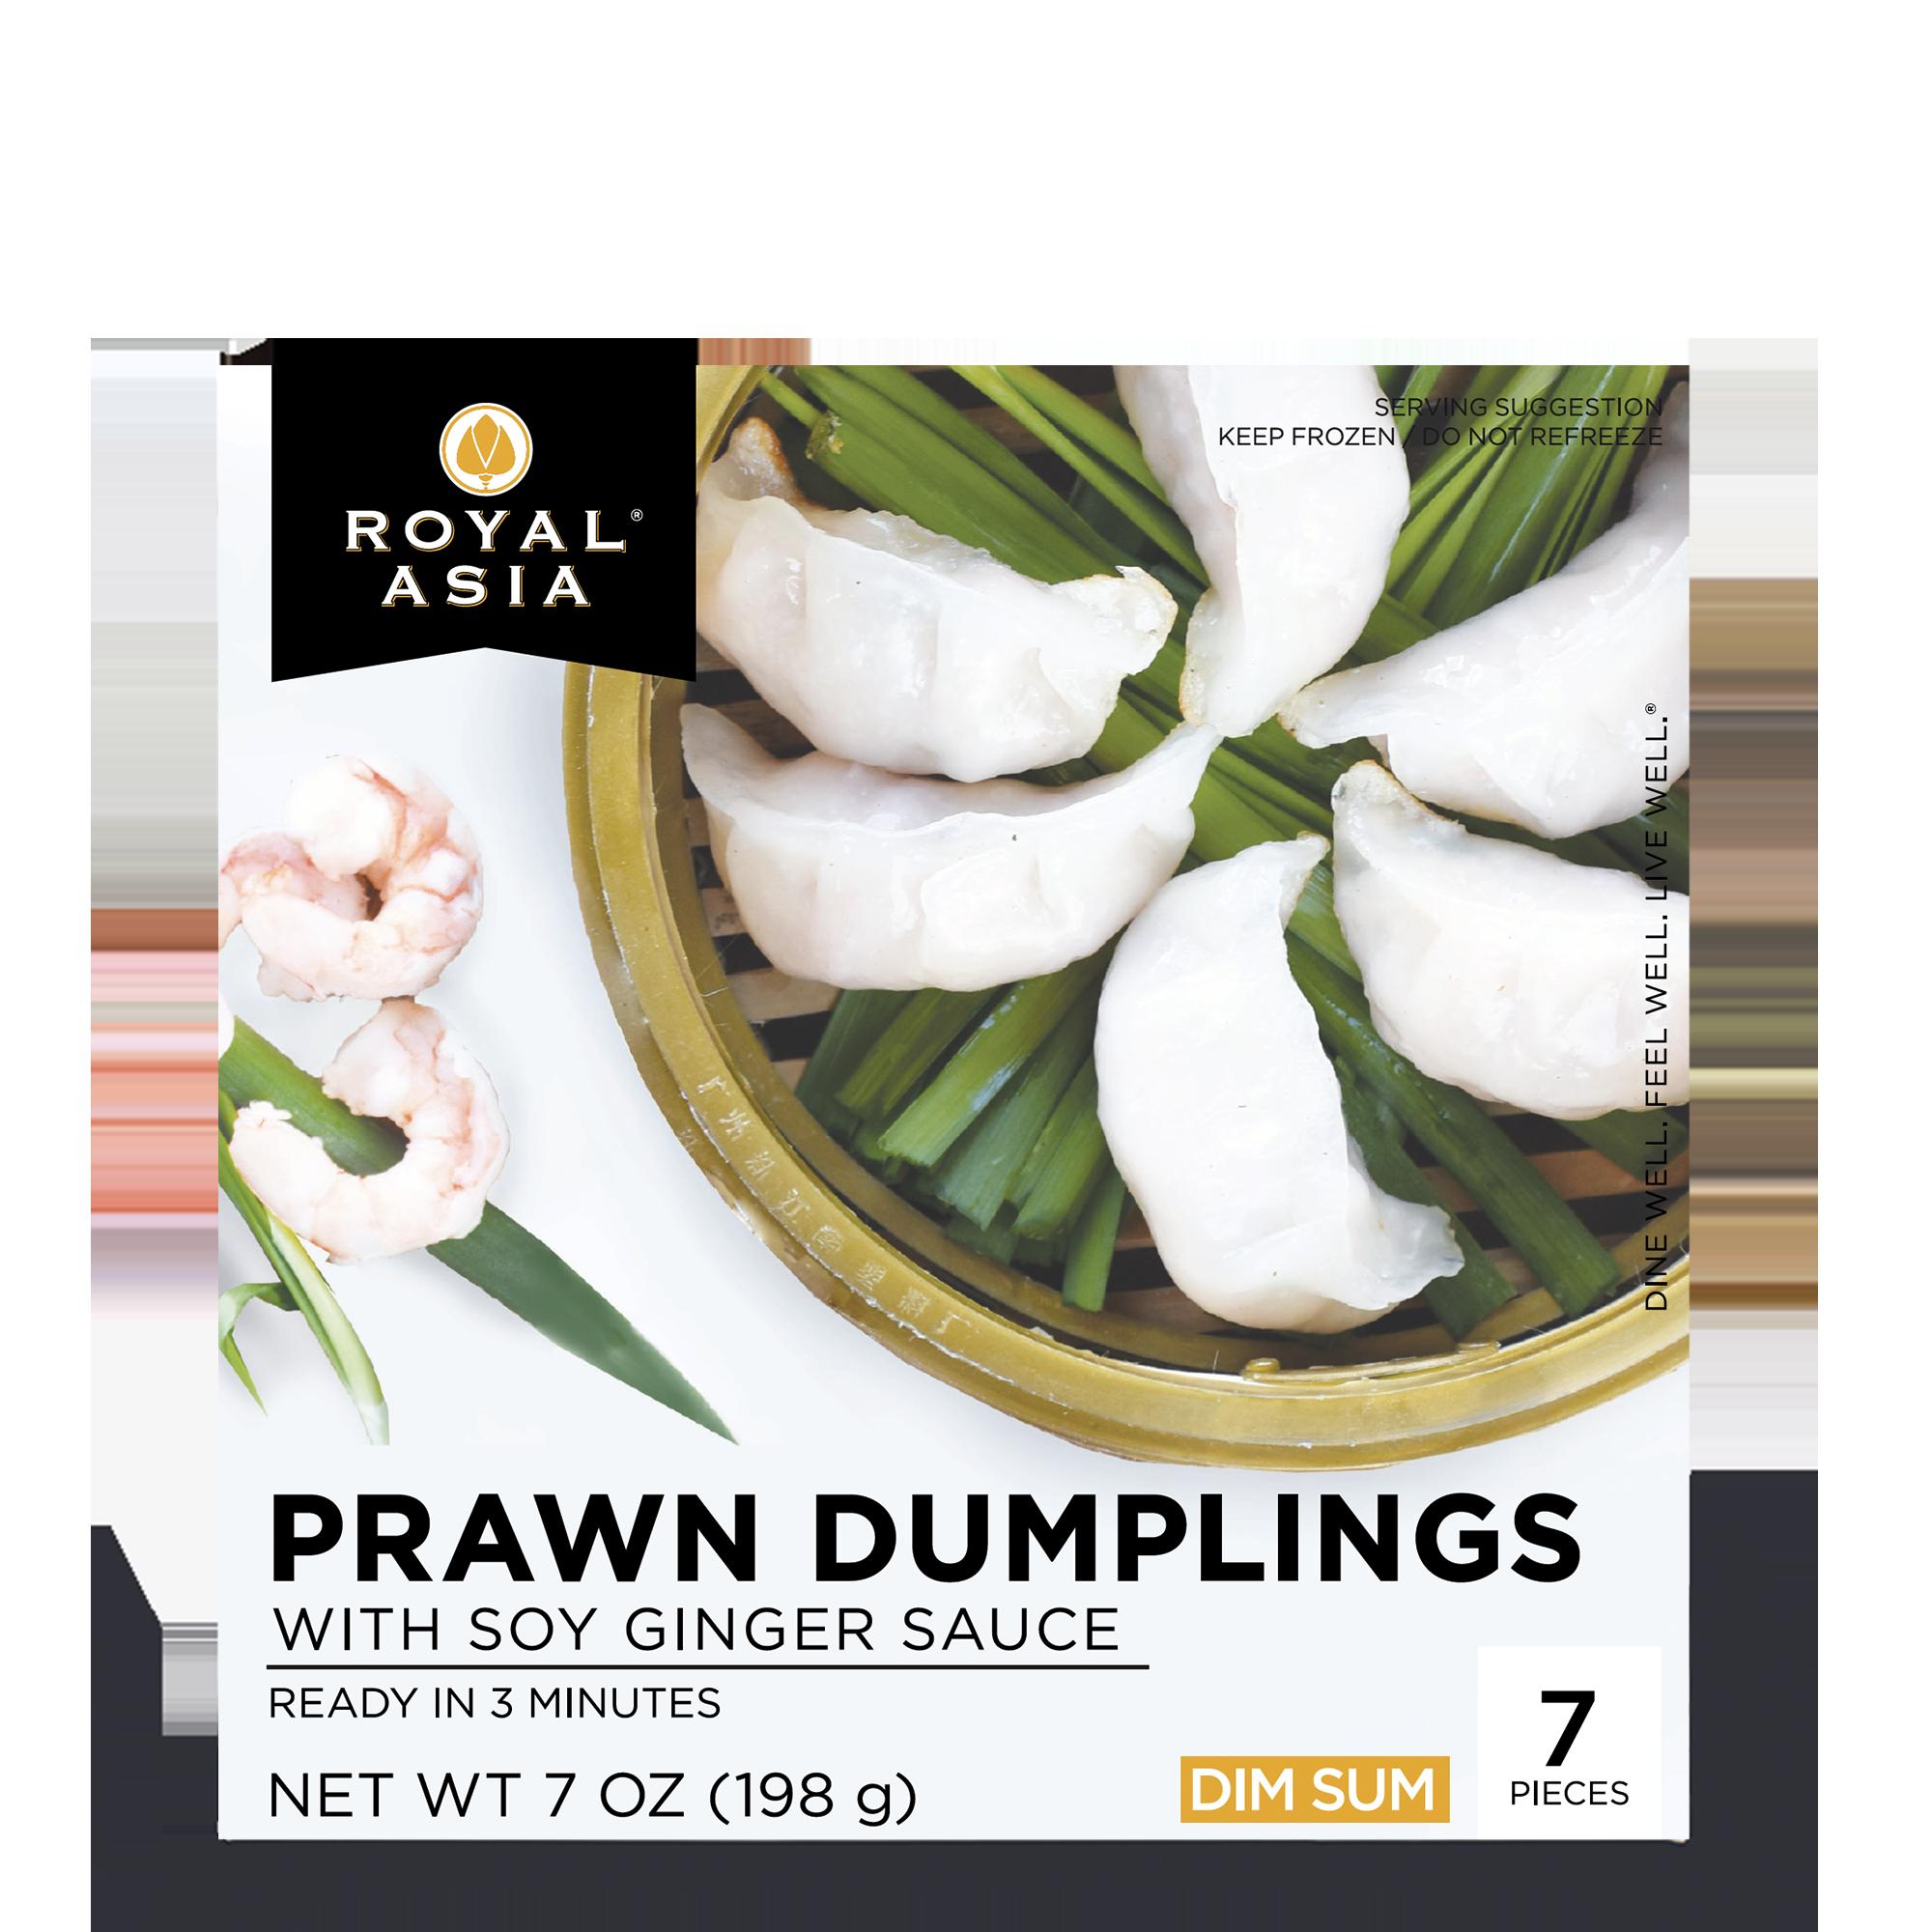 royal asian prawn dumplings